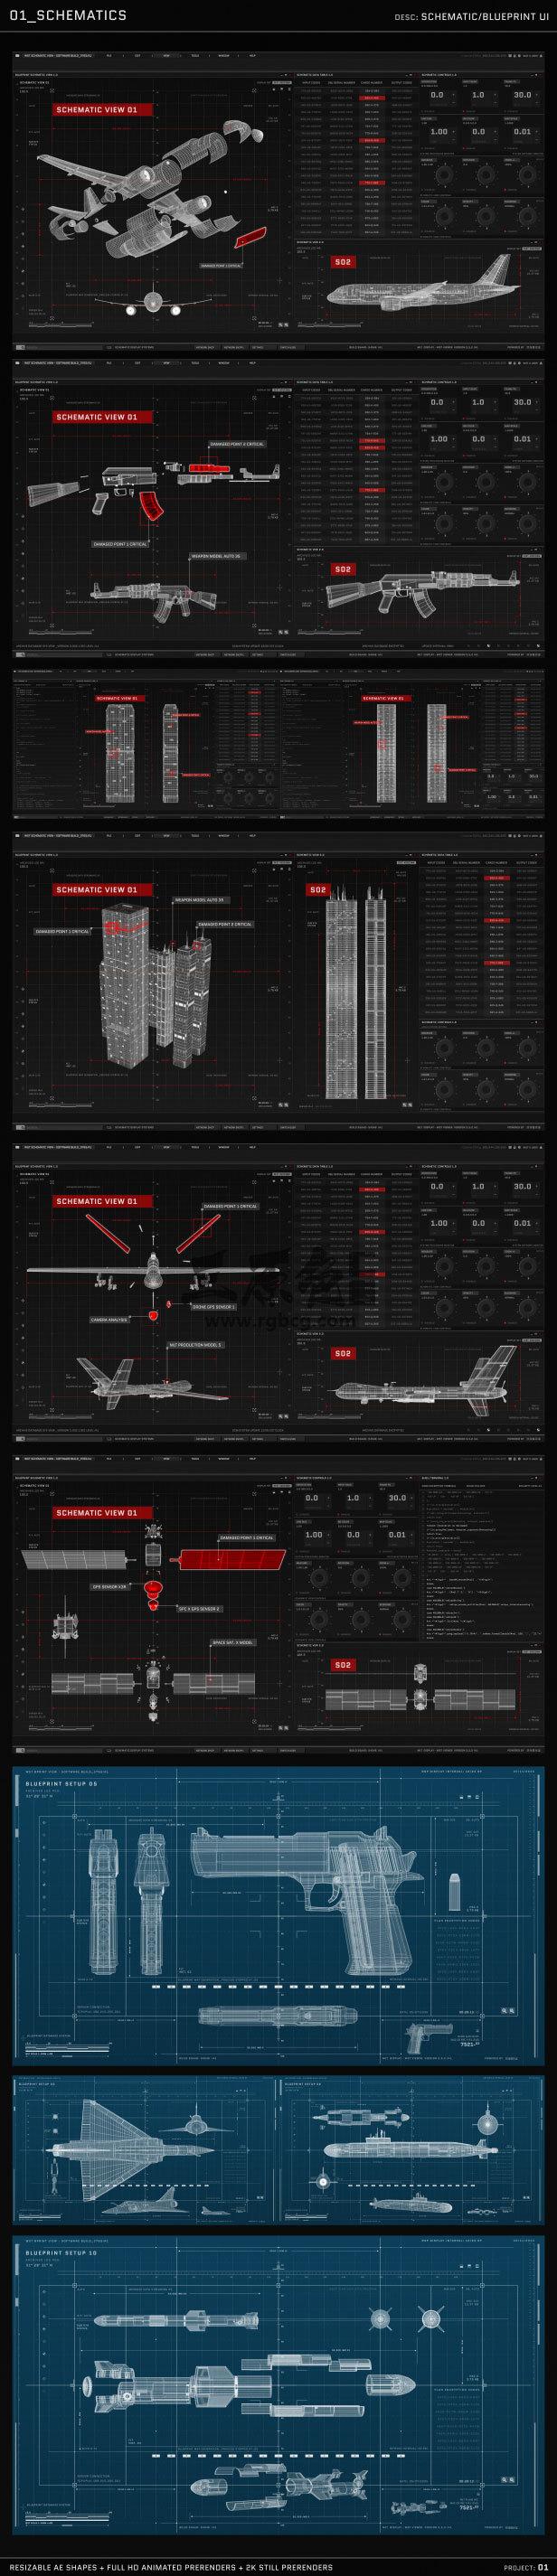 AE模板 电影.电视和游戏的UI图形HUD动画 HUD UI Graphics Ae 模板-第1张